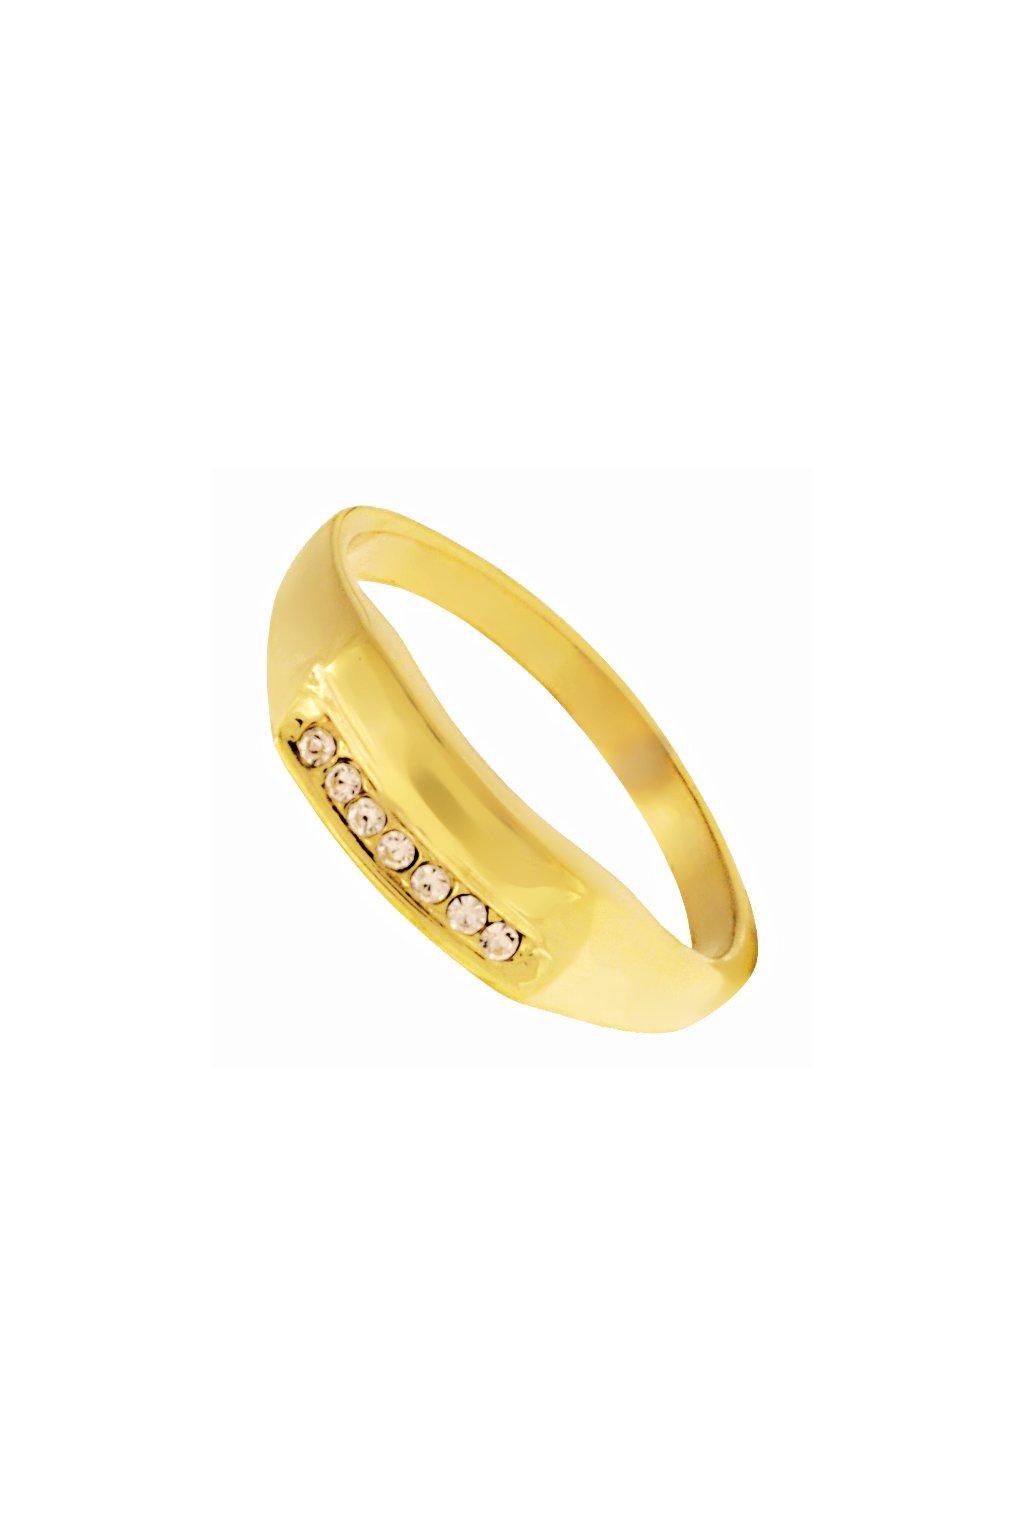 Skalimar Prsten z chirurgické oceli GOLDEN ELEGANCE 312593